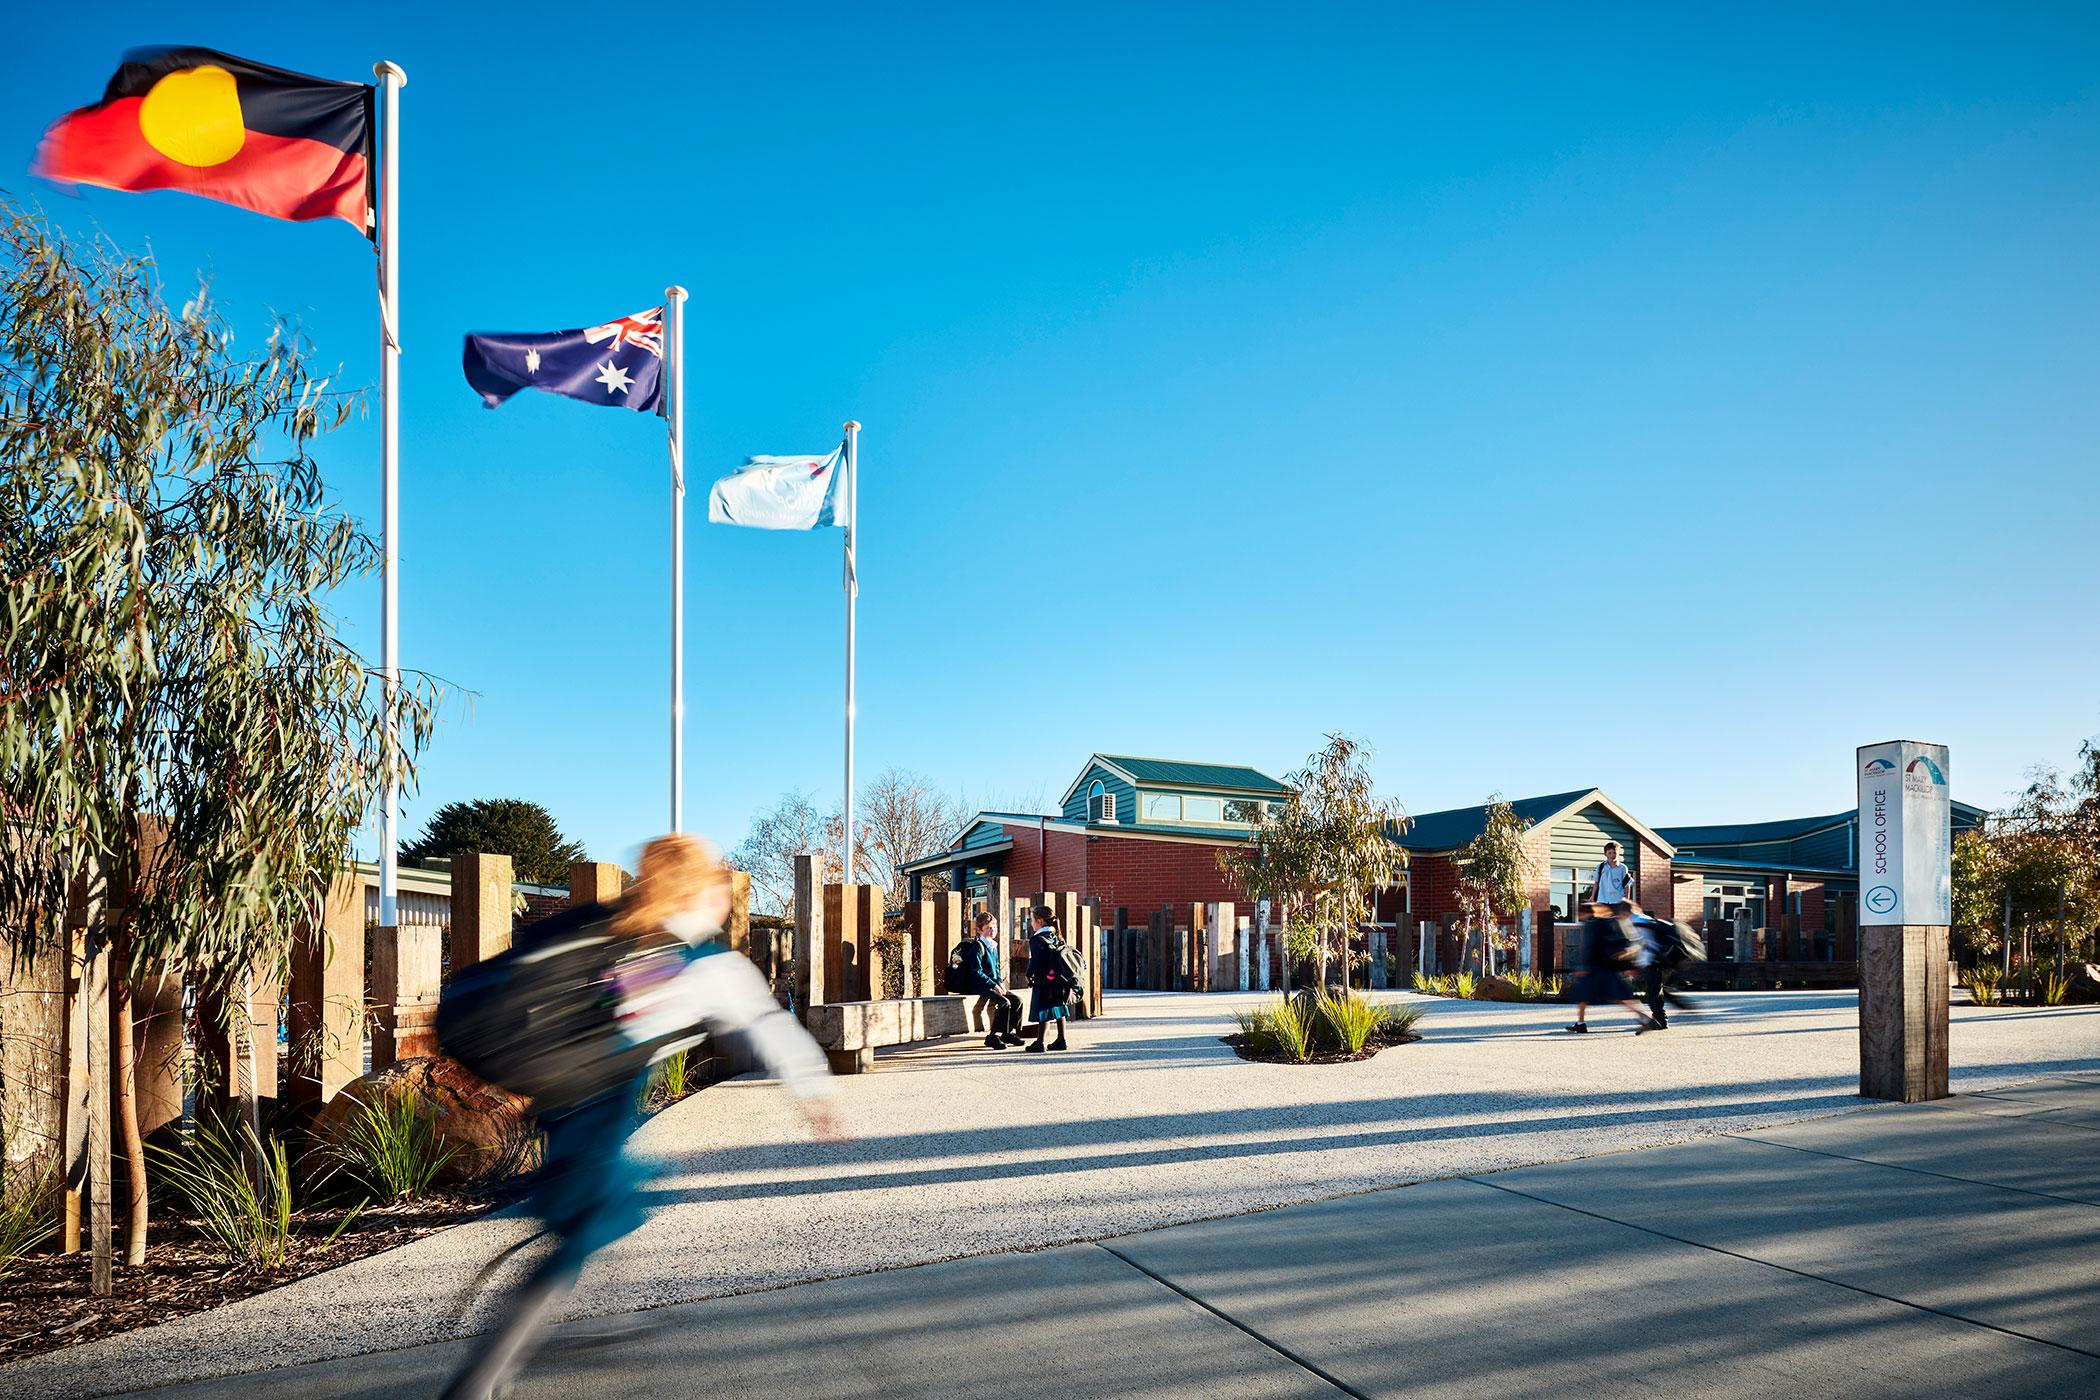 ST MARY MACKILLOP CATHOLIC PRIMARY SCHOOL - Australian Flag 3